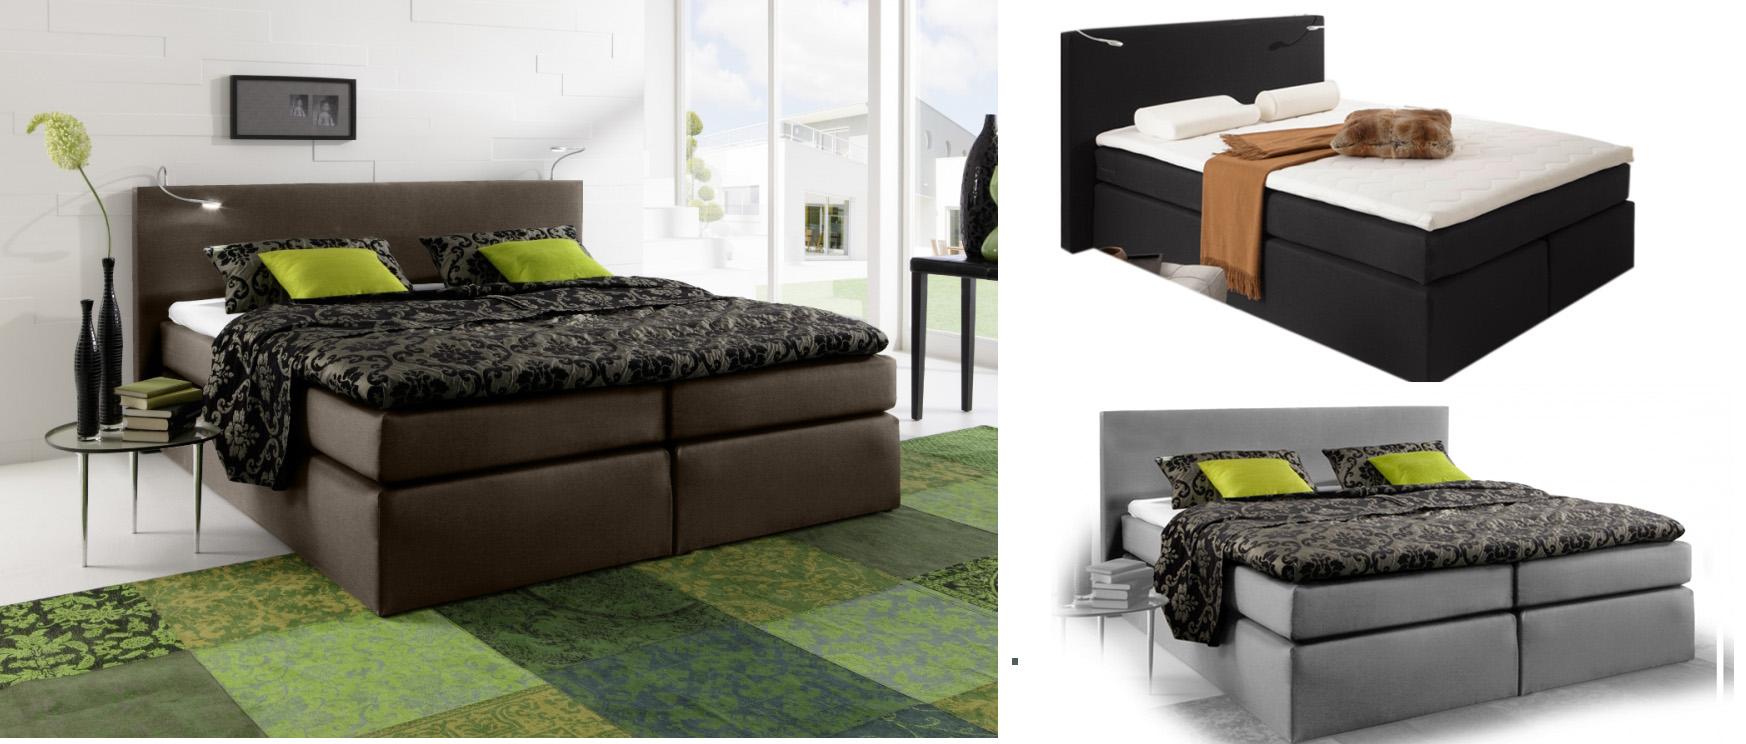 boxspringbett boxspringbetten h2 inkl topper 140 160 180x200 doppelbett savanna ebay. Black Bedroom Furniture Sets. Home Design Ideas